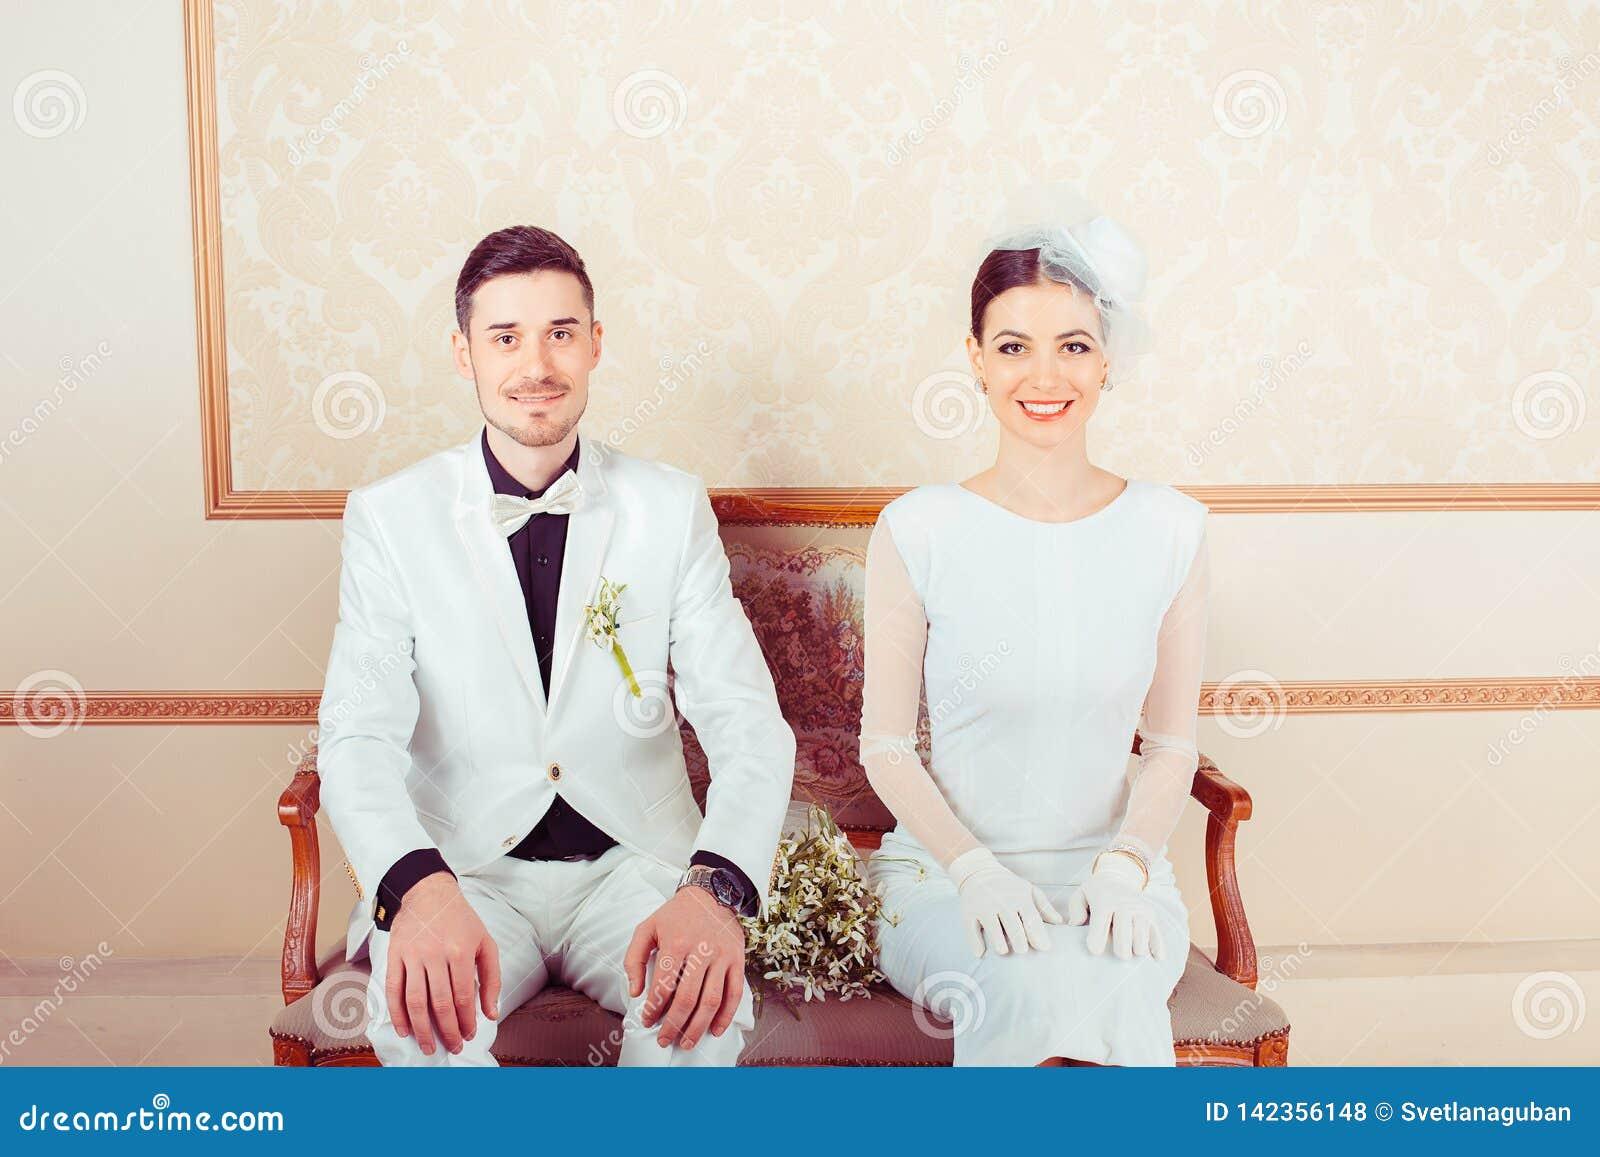 Young stylish bride and groom on sofa